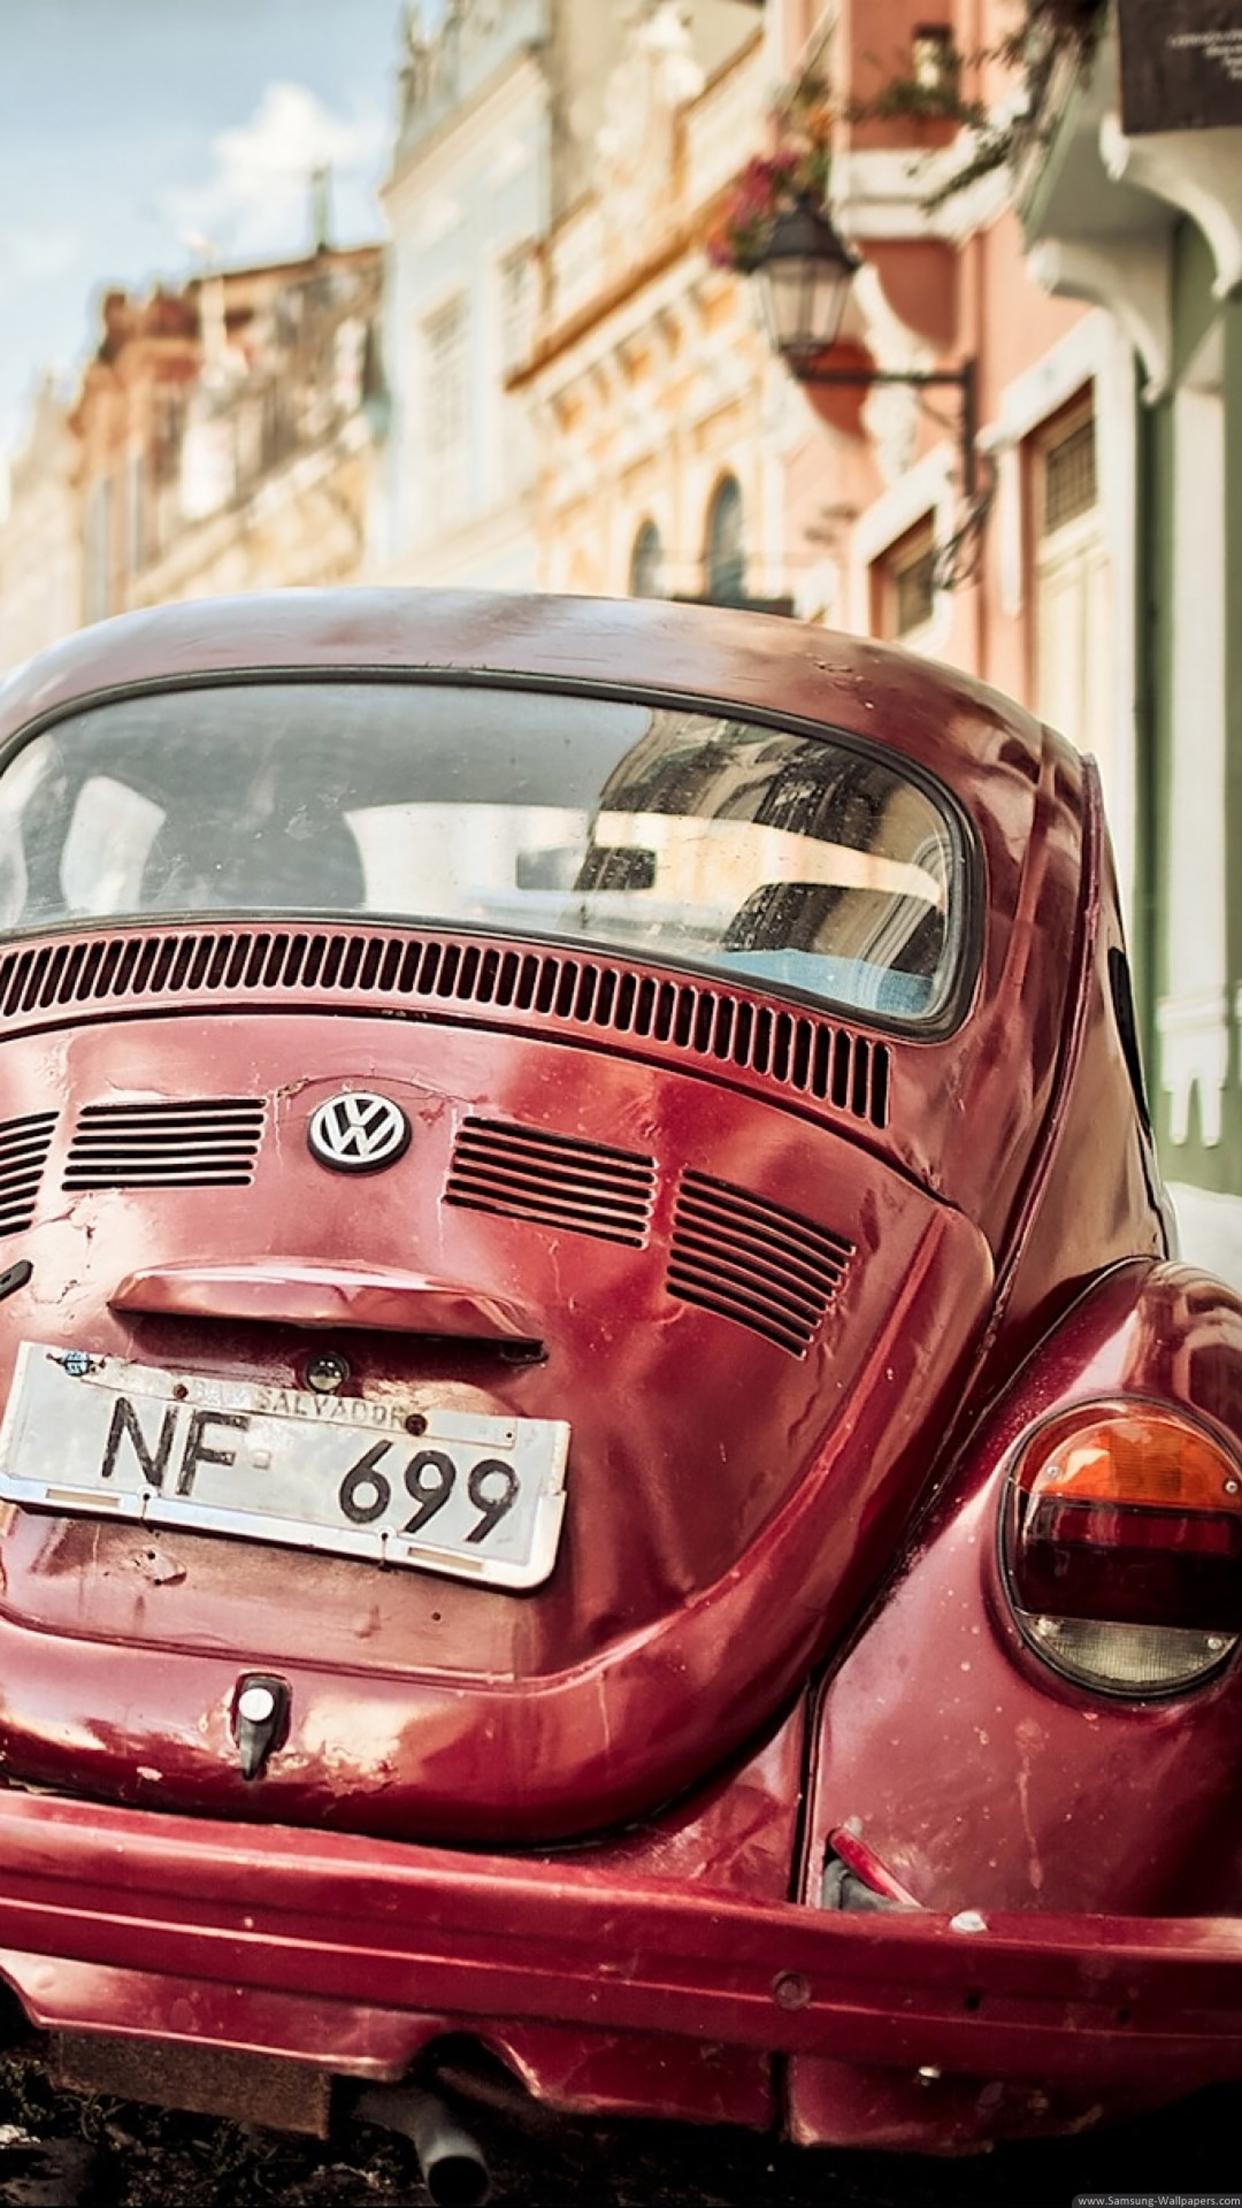 Vintage Cars Volkswagen Beetle 3Wallpapers iPhone Parallax Vintage Cars Volkswagen Beetle